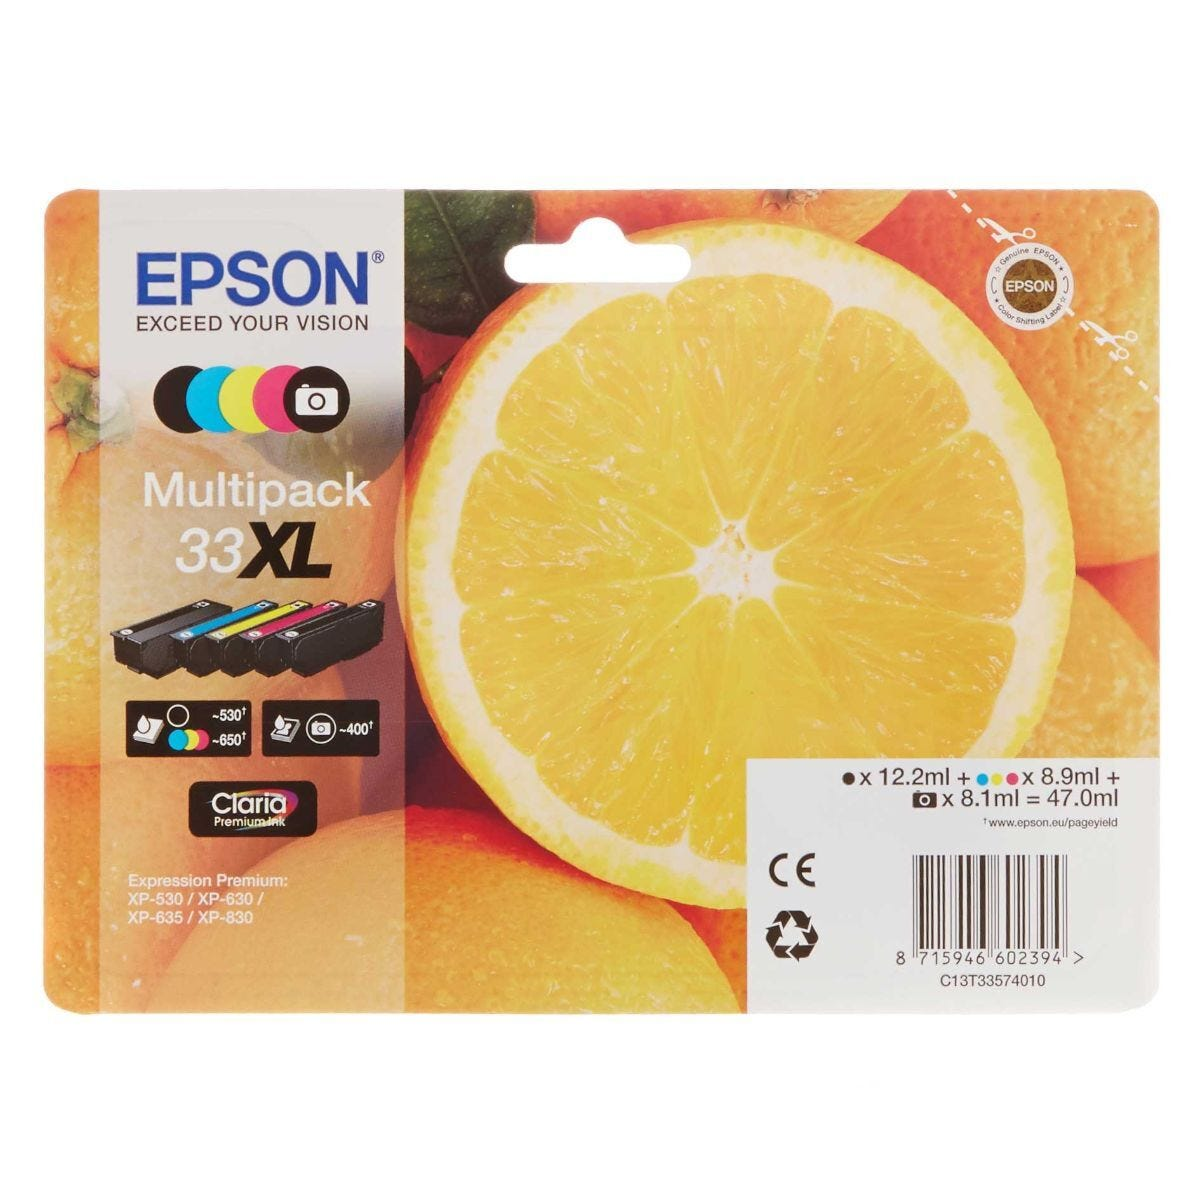 Epson 33XL Orange Multipack Original Ink Cartridges